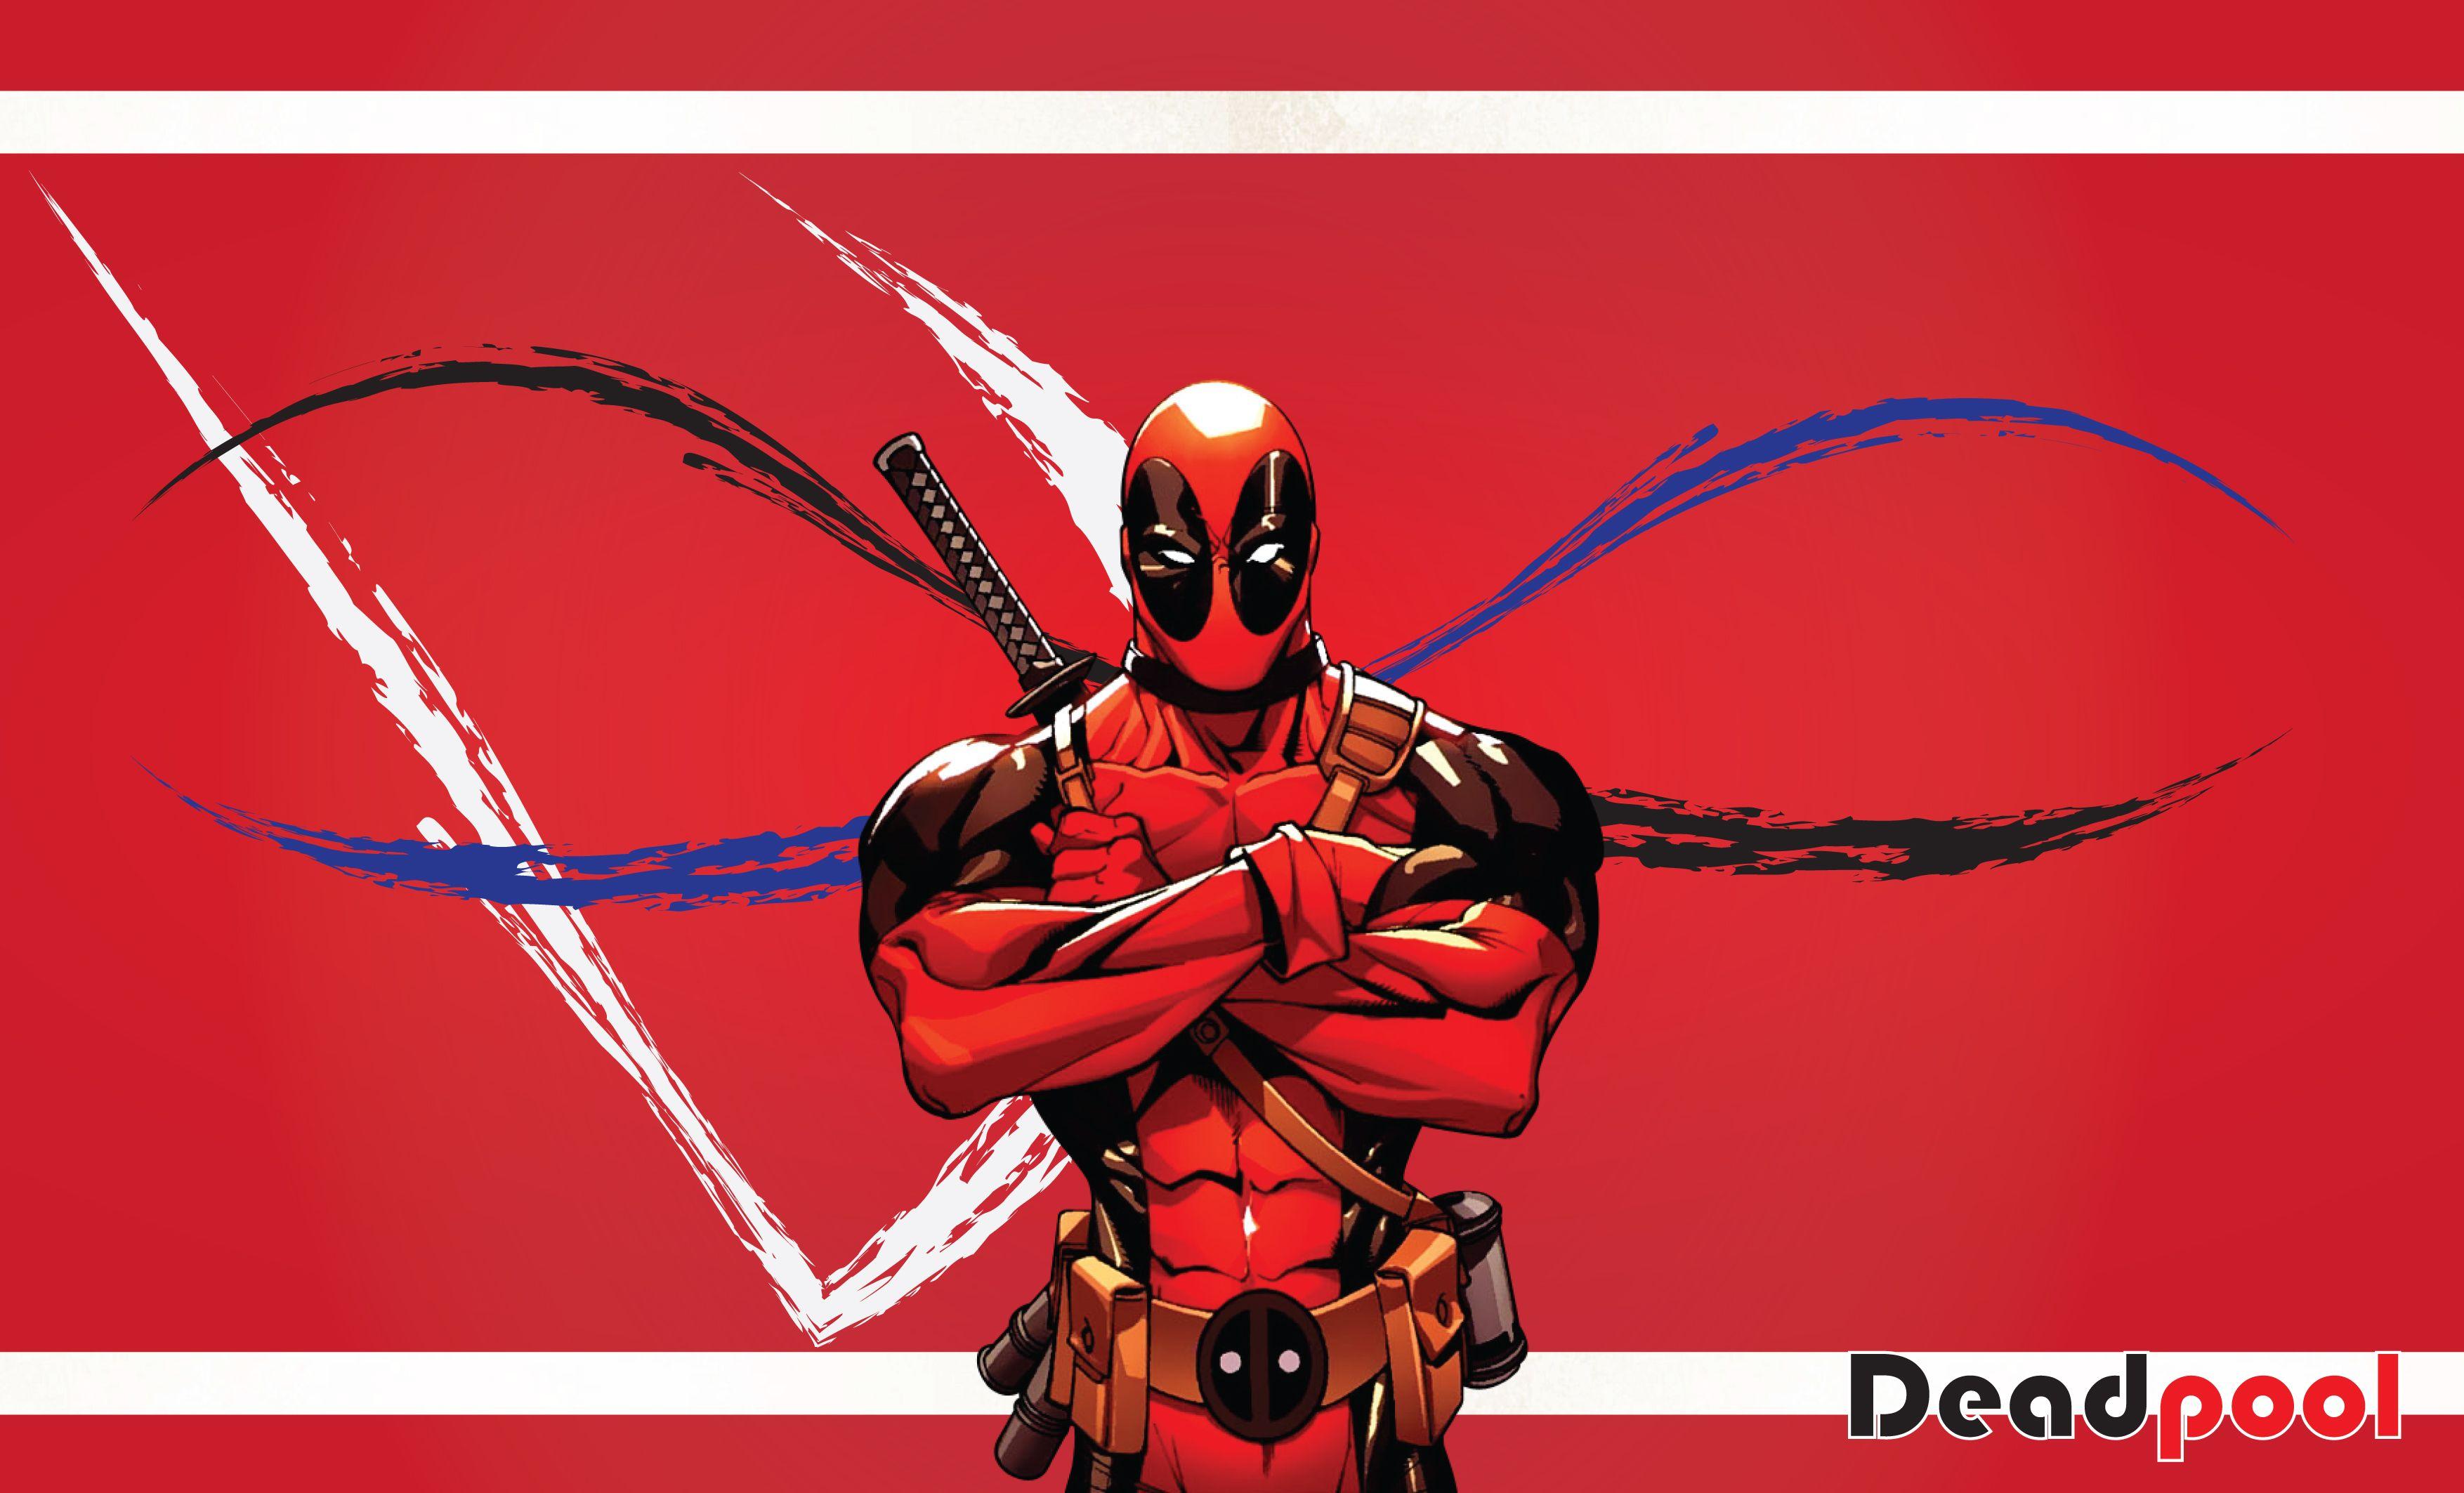 Amazing Wallpaper High Resolution Deadpool - 2caf443b4b3ba3aa21c76e9b6c392db5  Image_93628.jpg